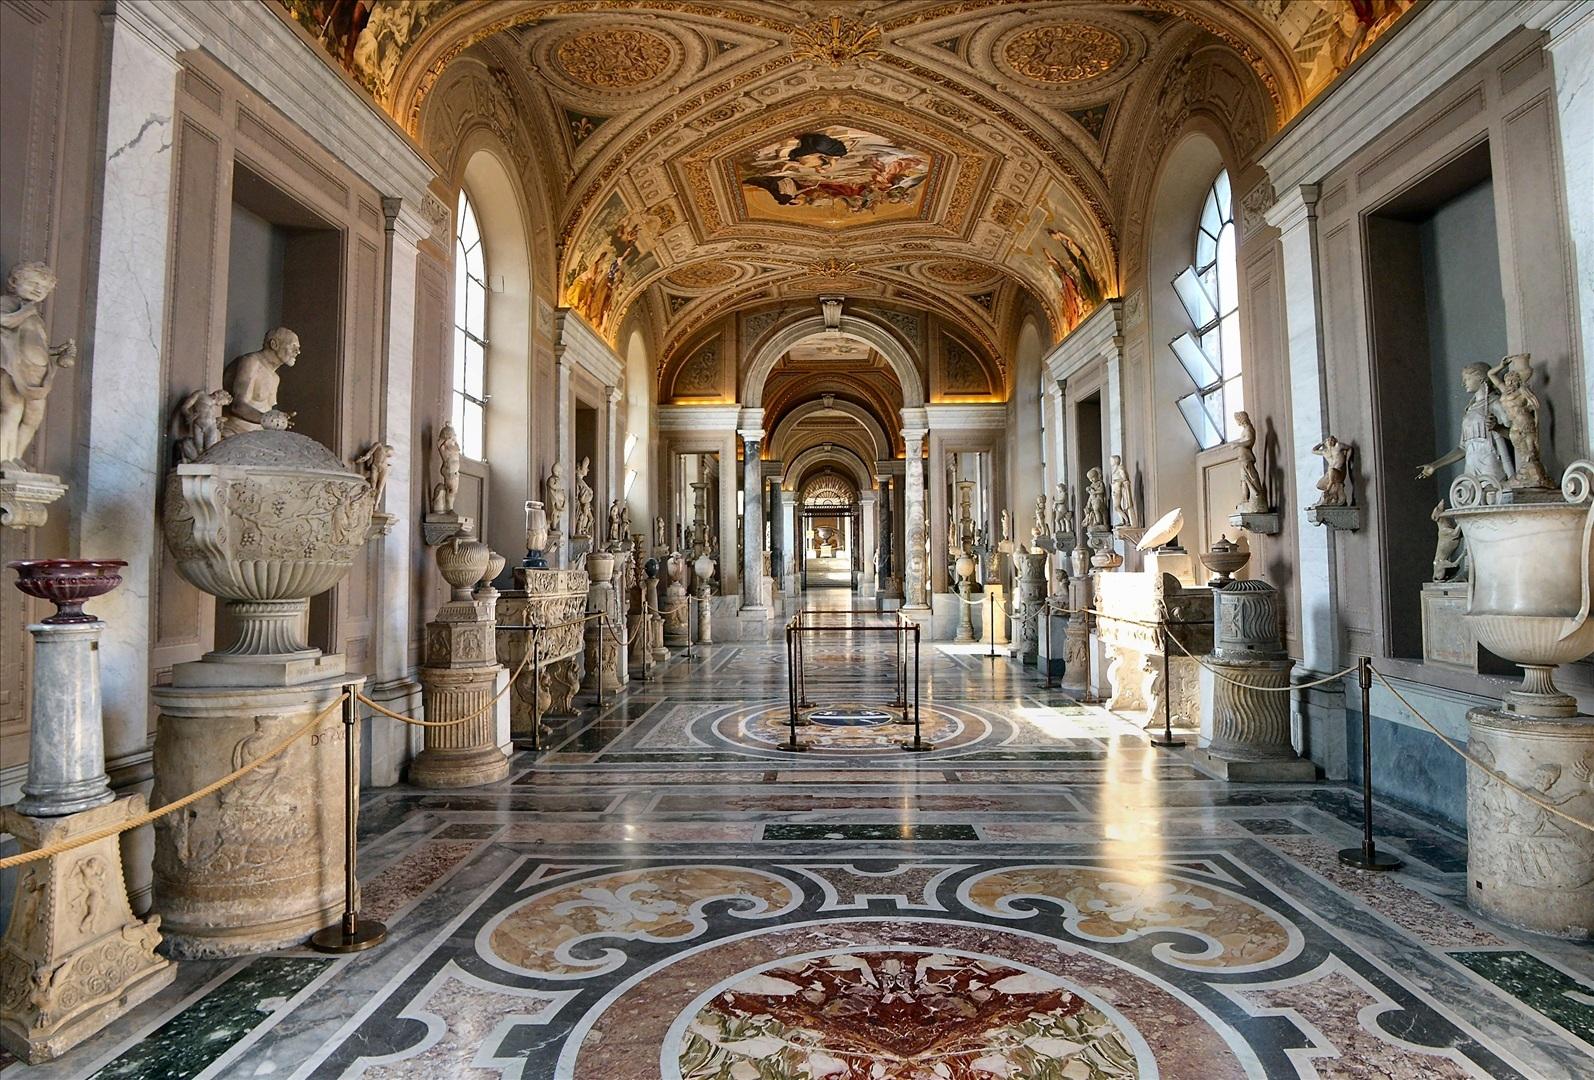 inside-vatican-museums-vatican-city-wallpaper-1594x1080